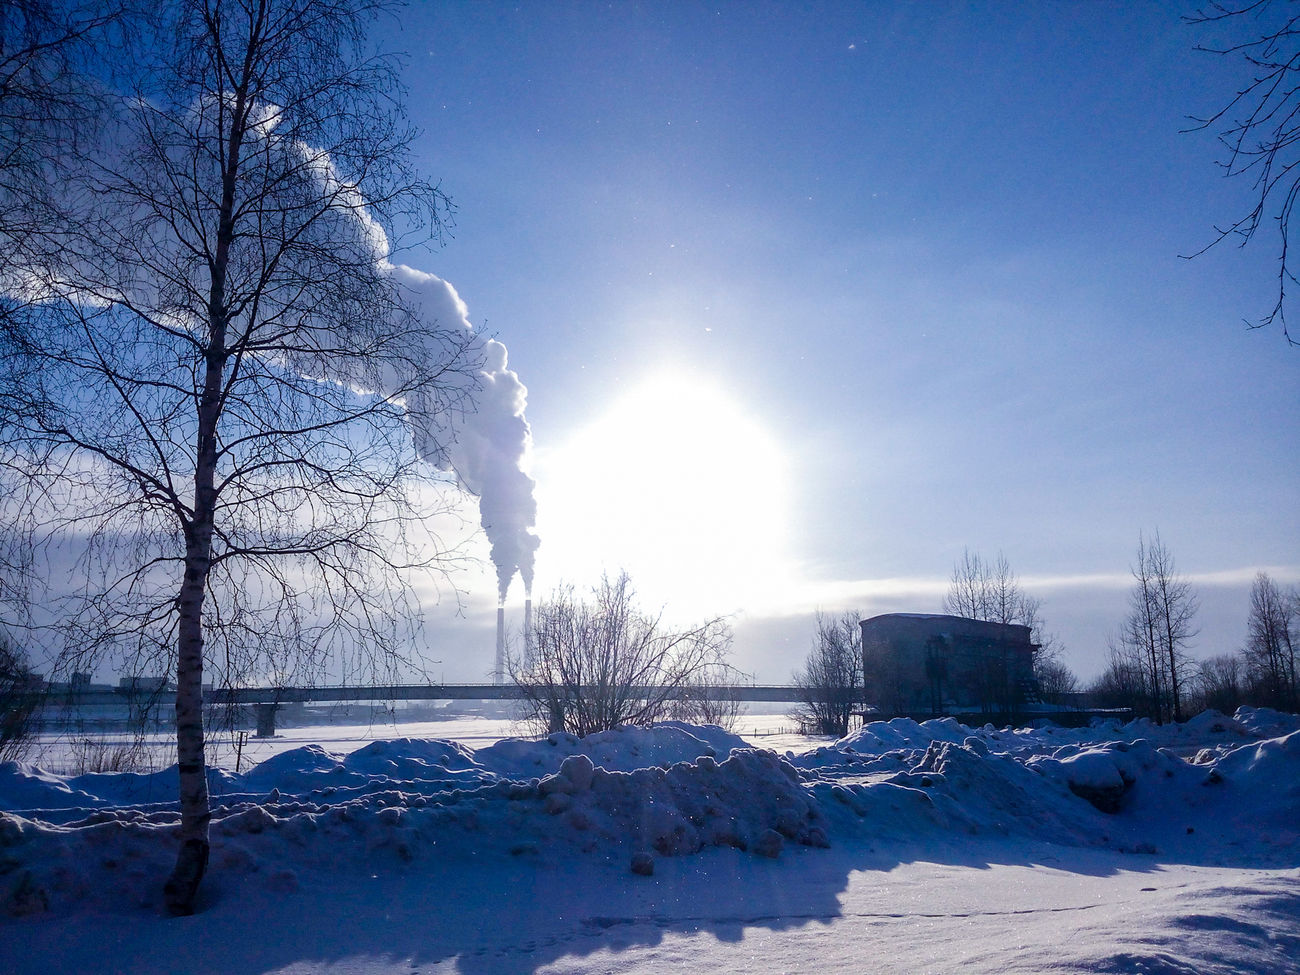 Архангельск, Сульфат Nature Snow Cold Temperature Sky Beauty In Nature Winter No People Tree Day Архангельск аипк Сульфат ТЭС зима зима❄️ февраль мобильноефото